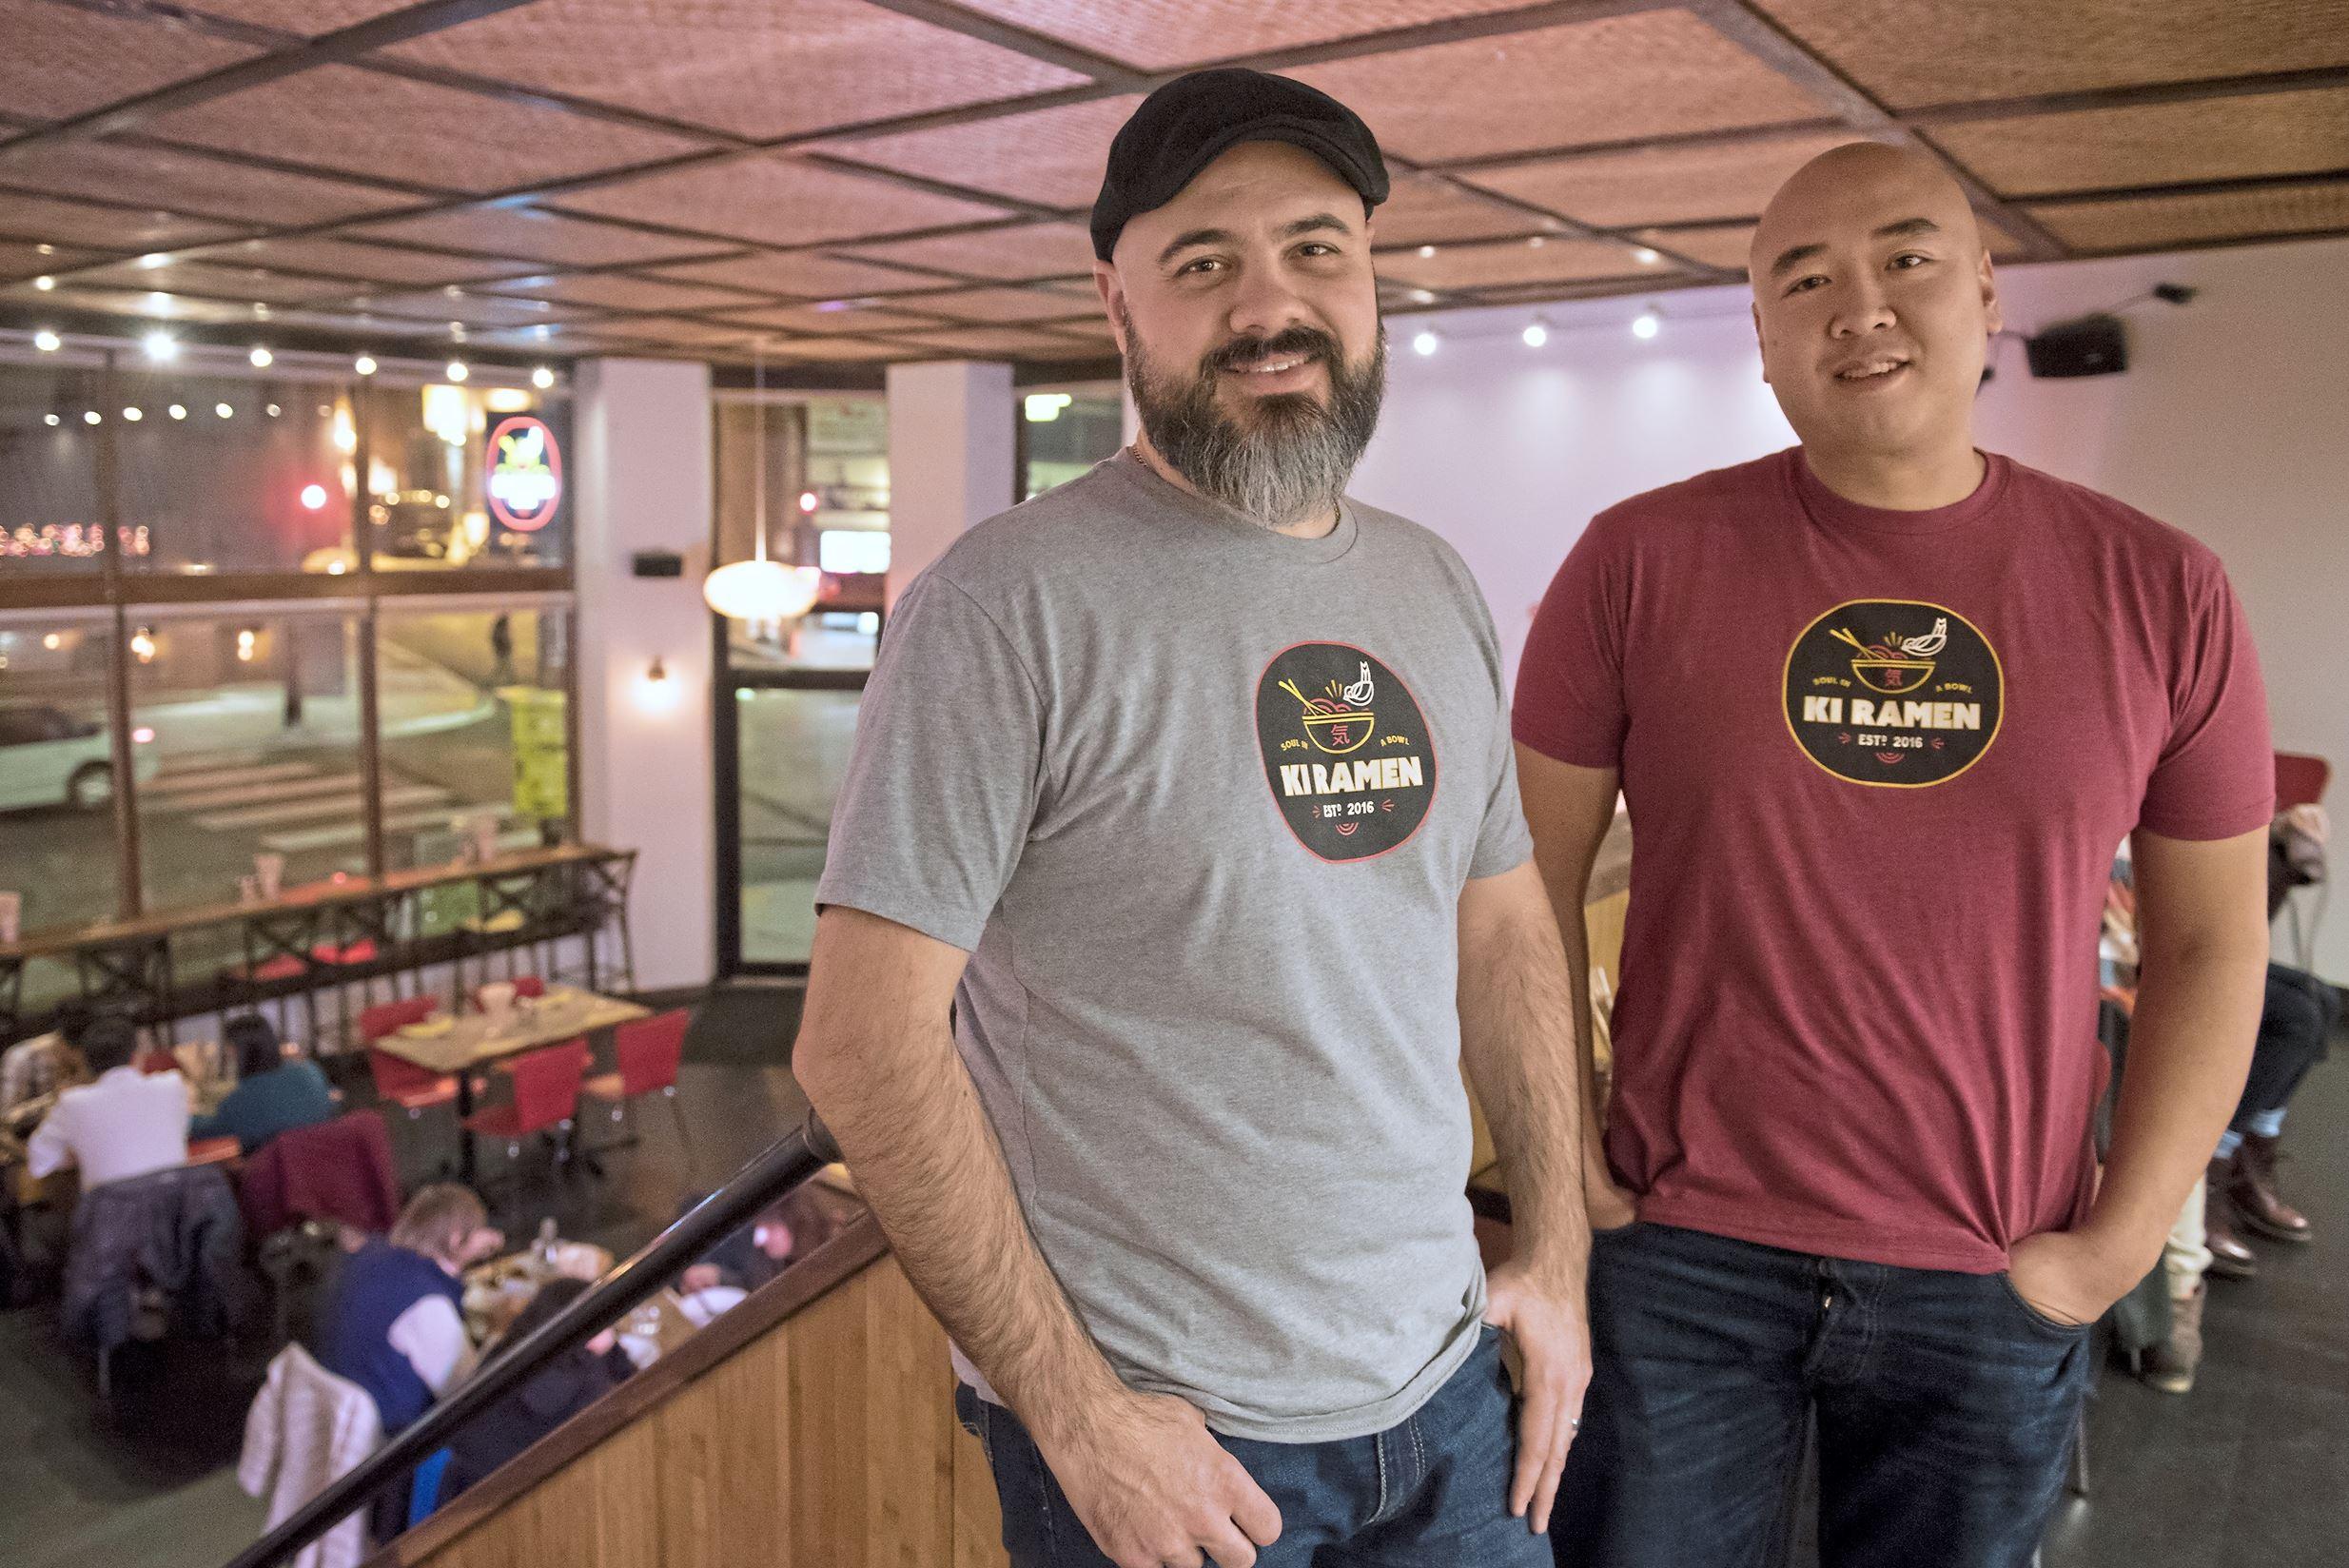 20171122hnKiRamen-2-1 Restaurant owners, Dom Branduzzi, left, and Roger Li, at Ki Ramen.